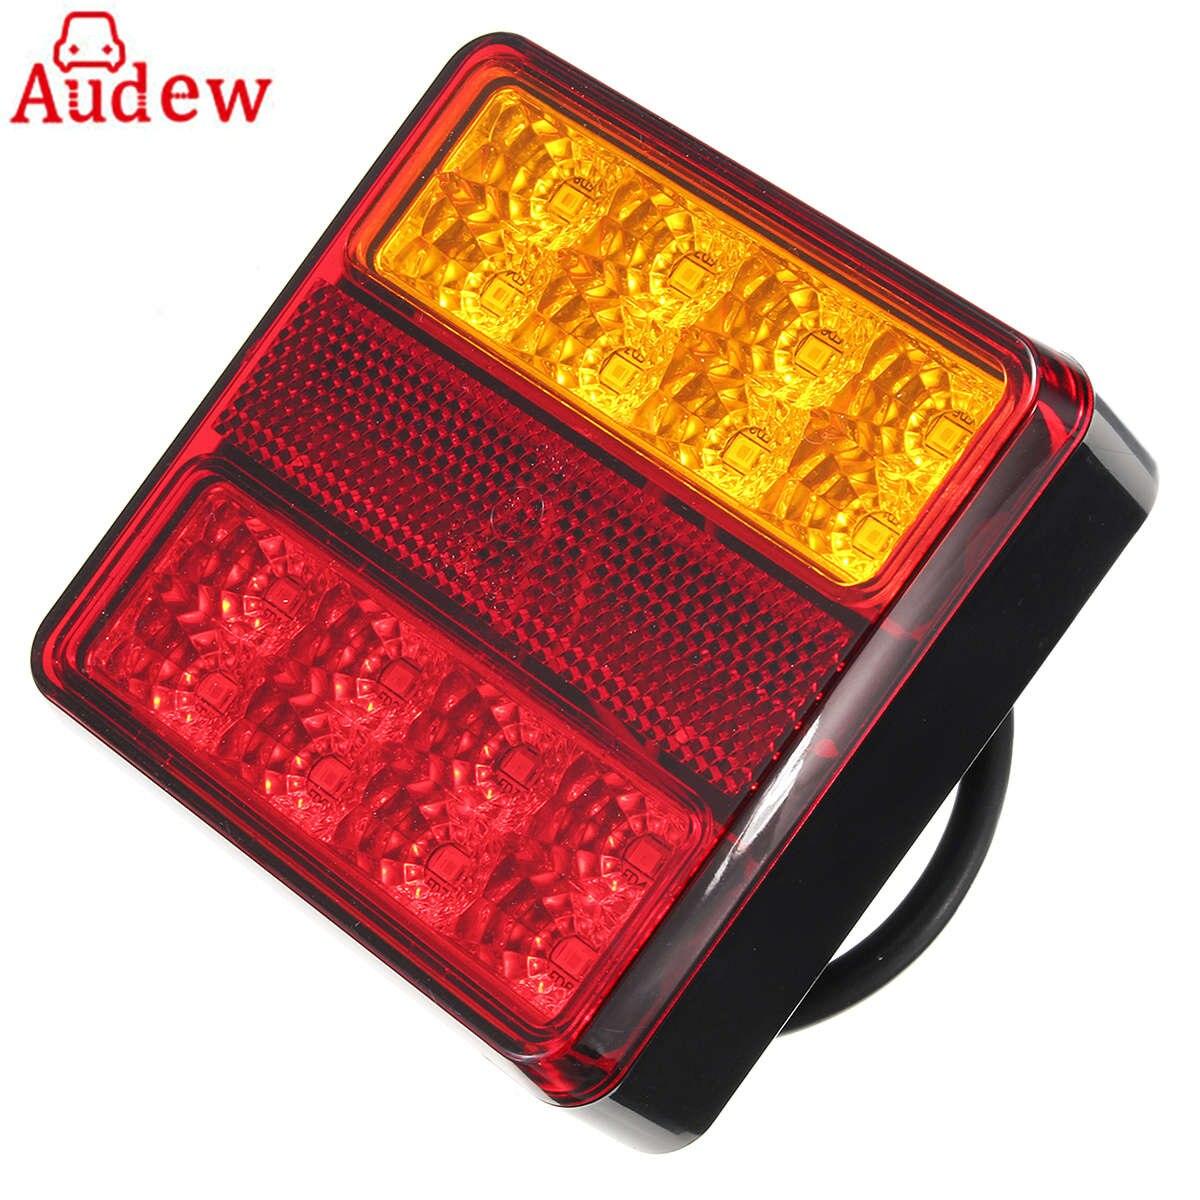 22LEDS Car Truck Rear Tail Light Warning Lights Rear font b Lamps b font Waterproof Tail